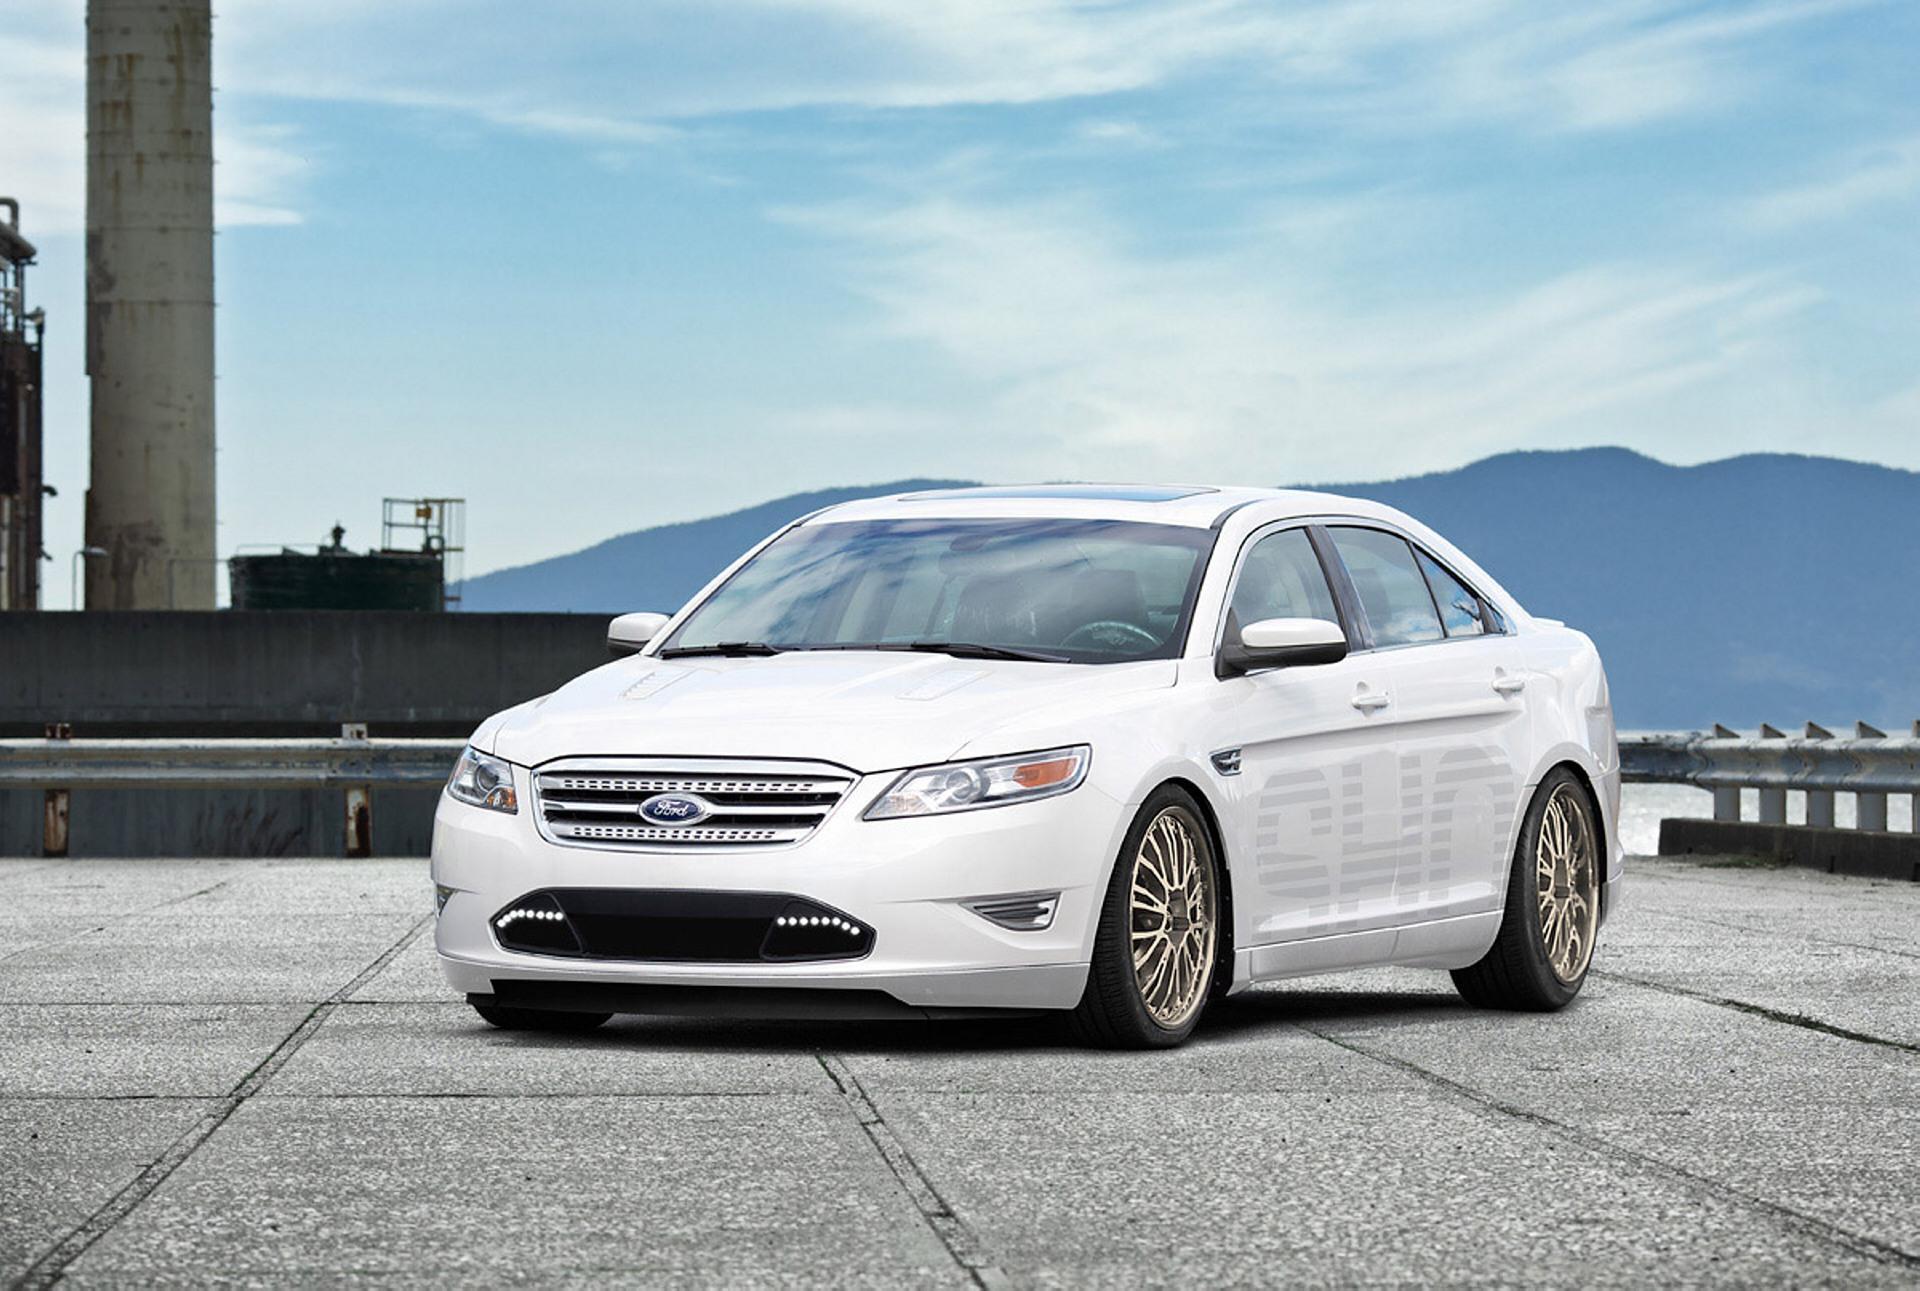 2011 Ford Taurus SHO by H&R Springs - conceptcarz.com